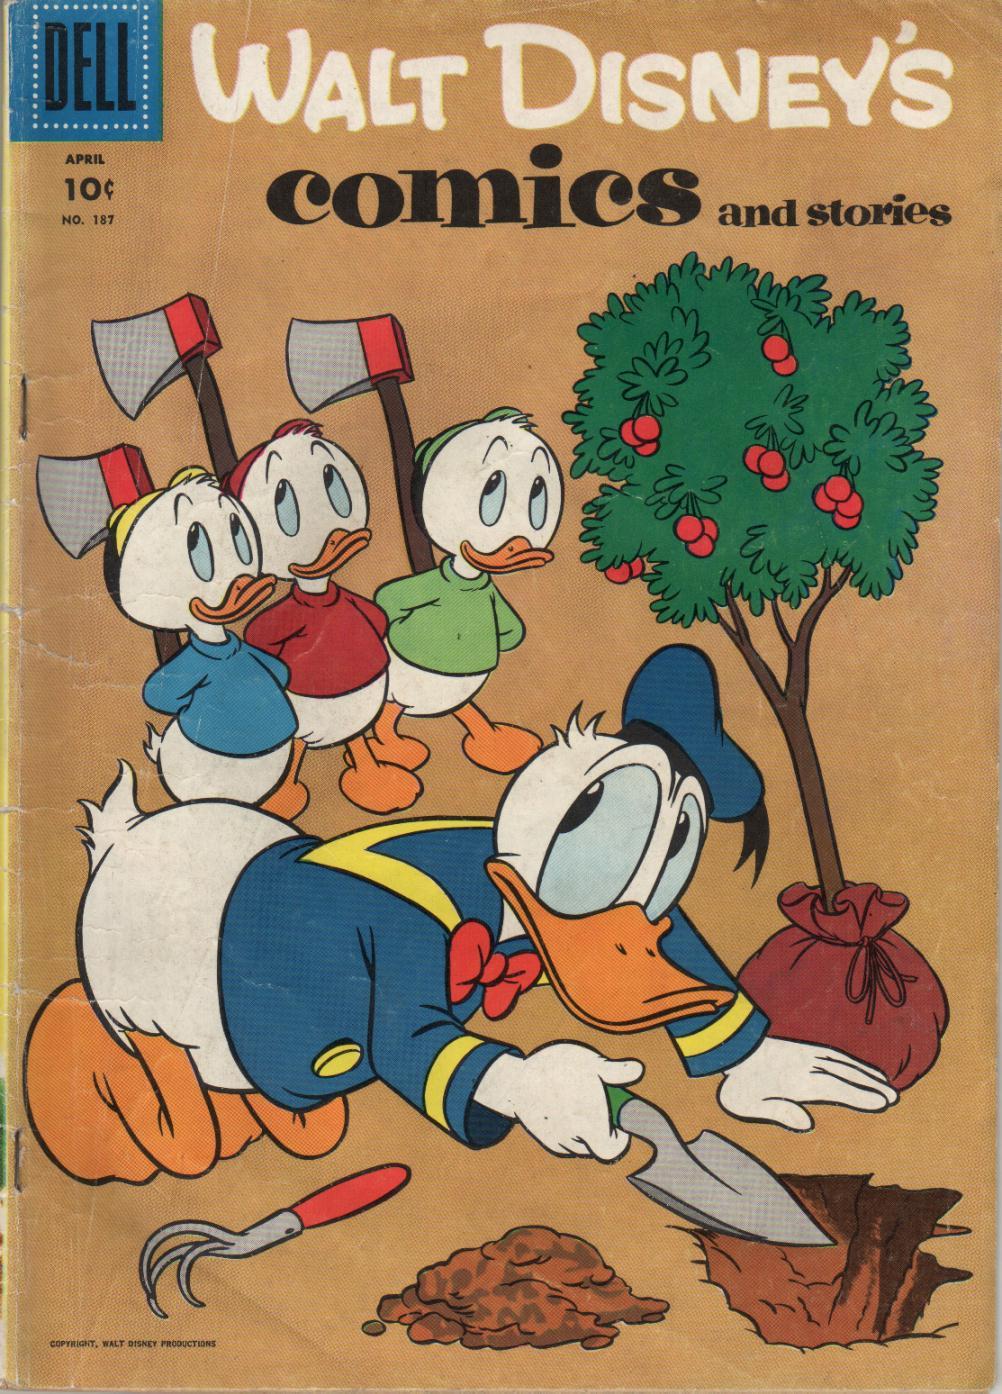 Walt Disneys Comics and Stories 187 Page 1